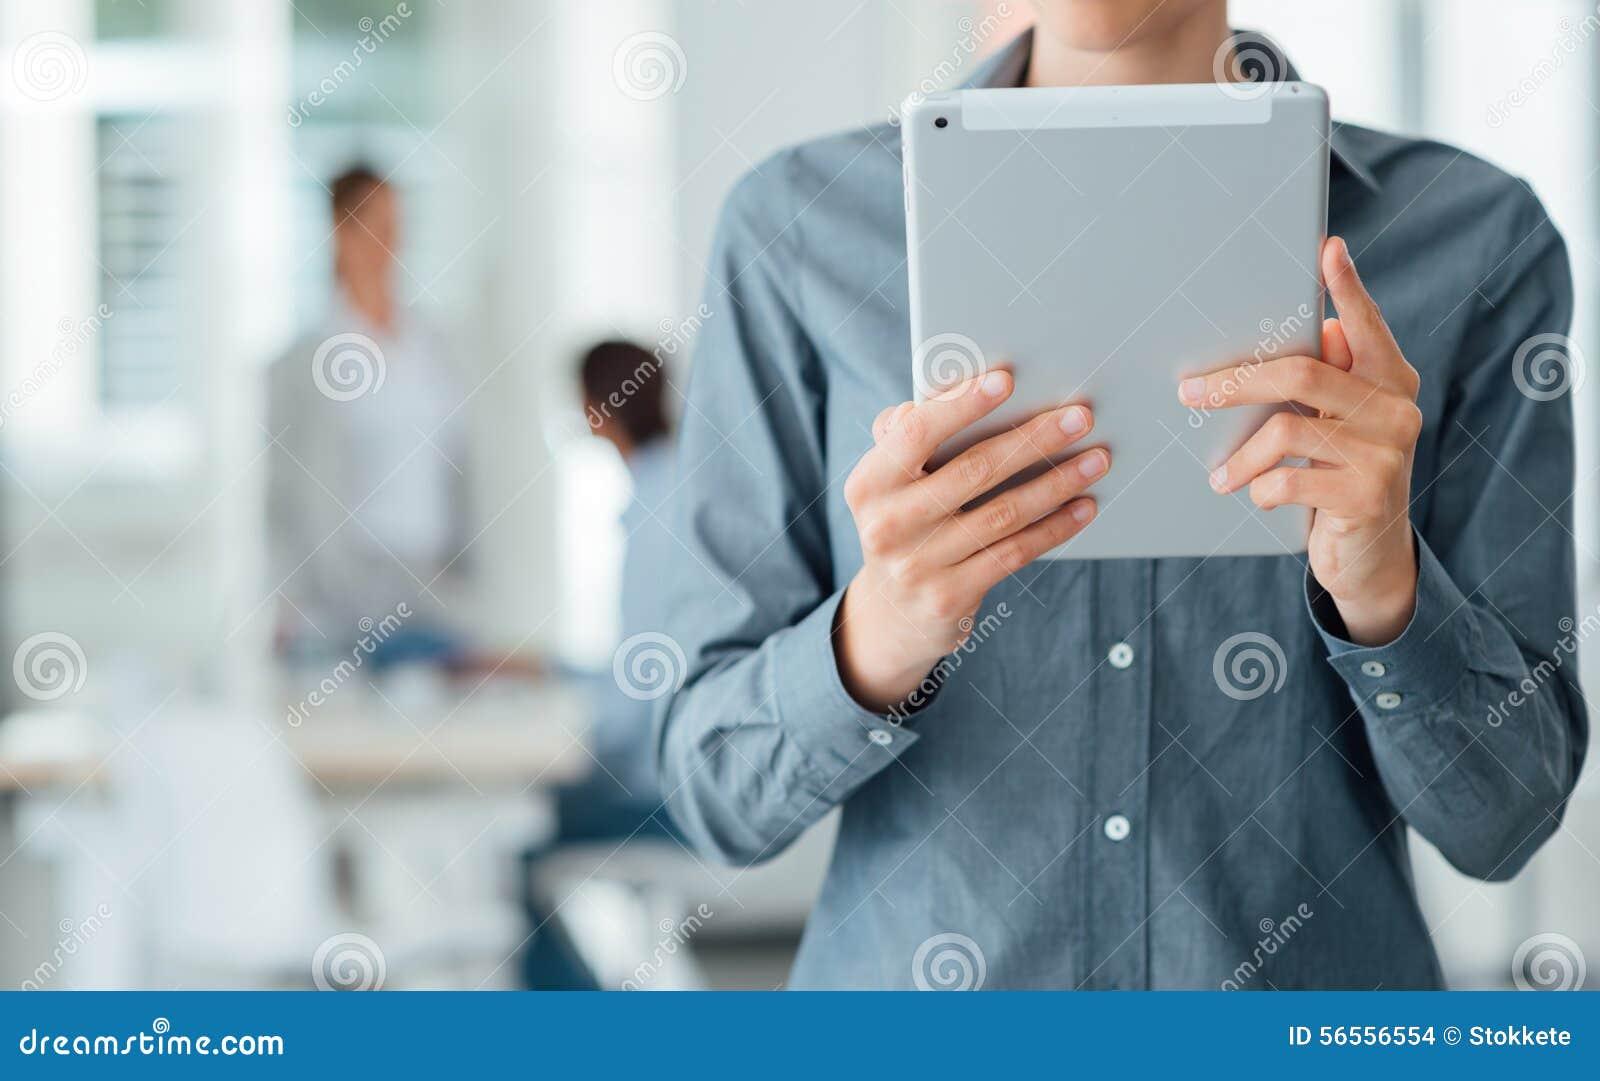 Download Βέβαια επιχειρησιακή γυναίκα που χρησιμοποιεί μια ταμπλέτα οθόνης αφής Στοκ Εικόνες - εικόνα από εσωτερικός, διαδίκτυο: 56556554